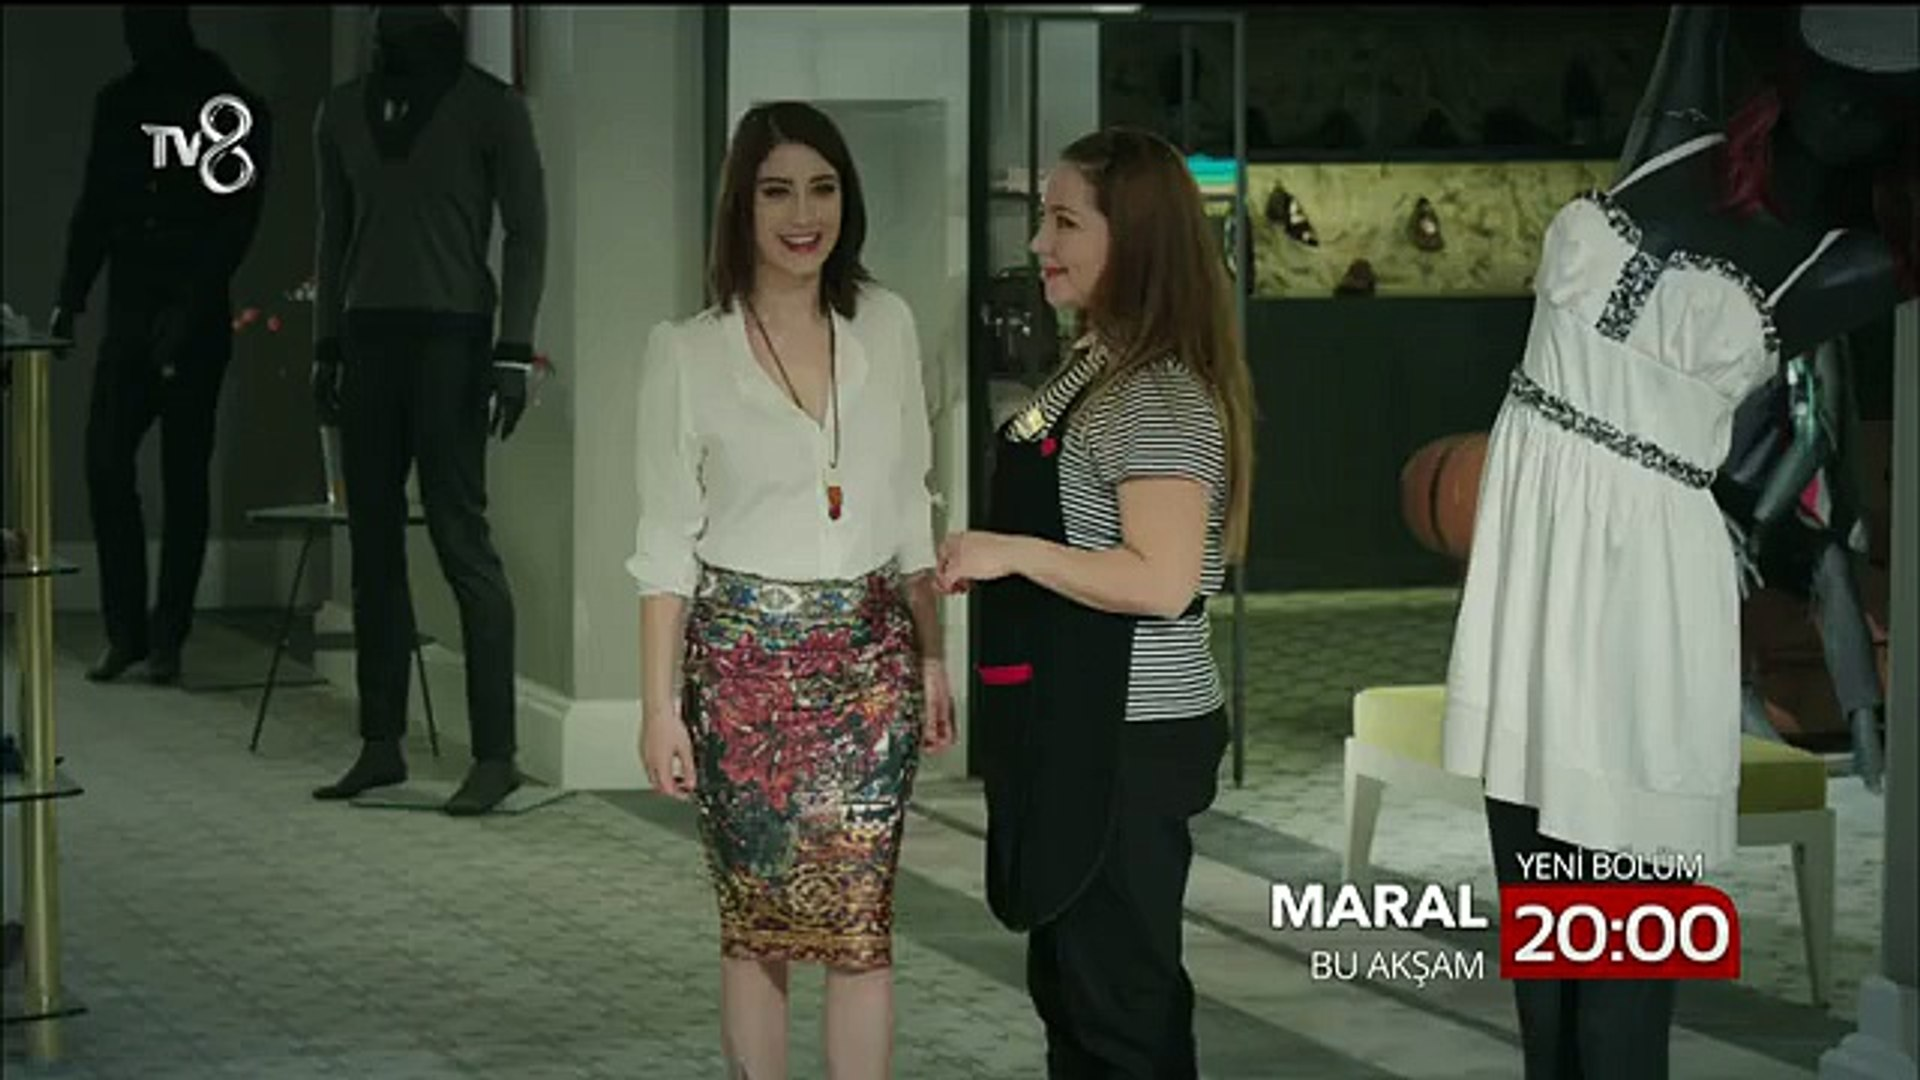 Maral En Guzel Hikayem 5 Bolum 3 Tanitimi Videolar Tv8 Dailymotion Video